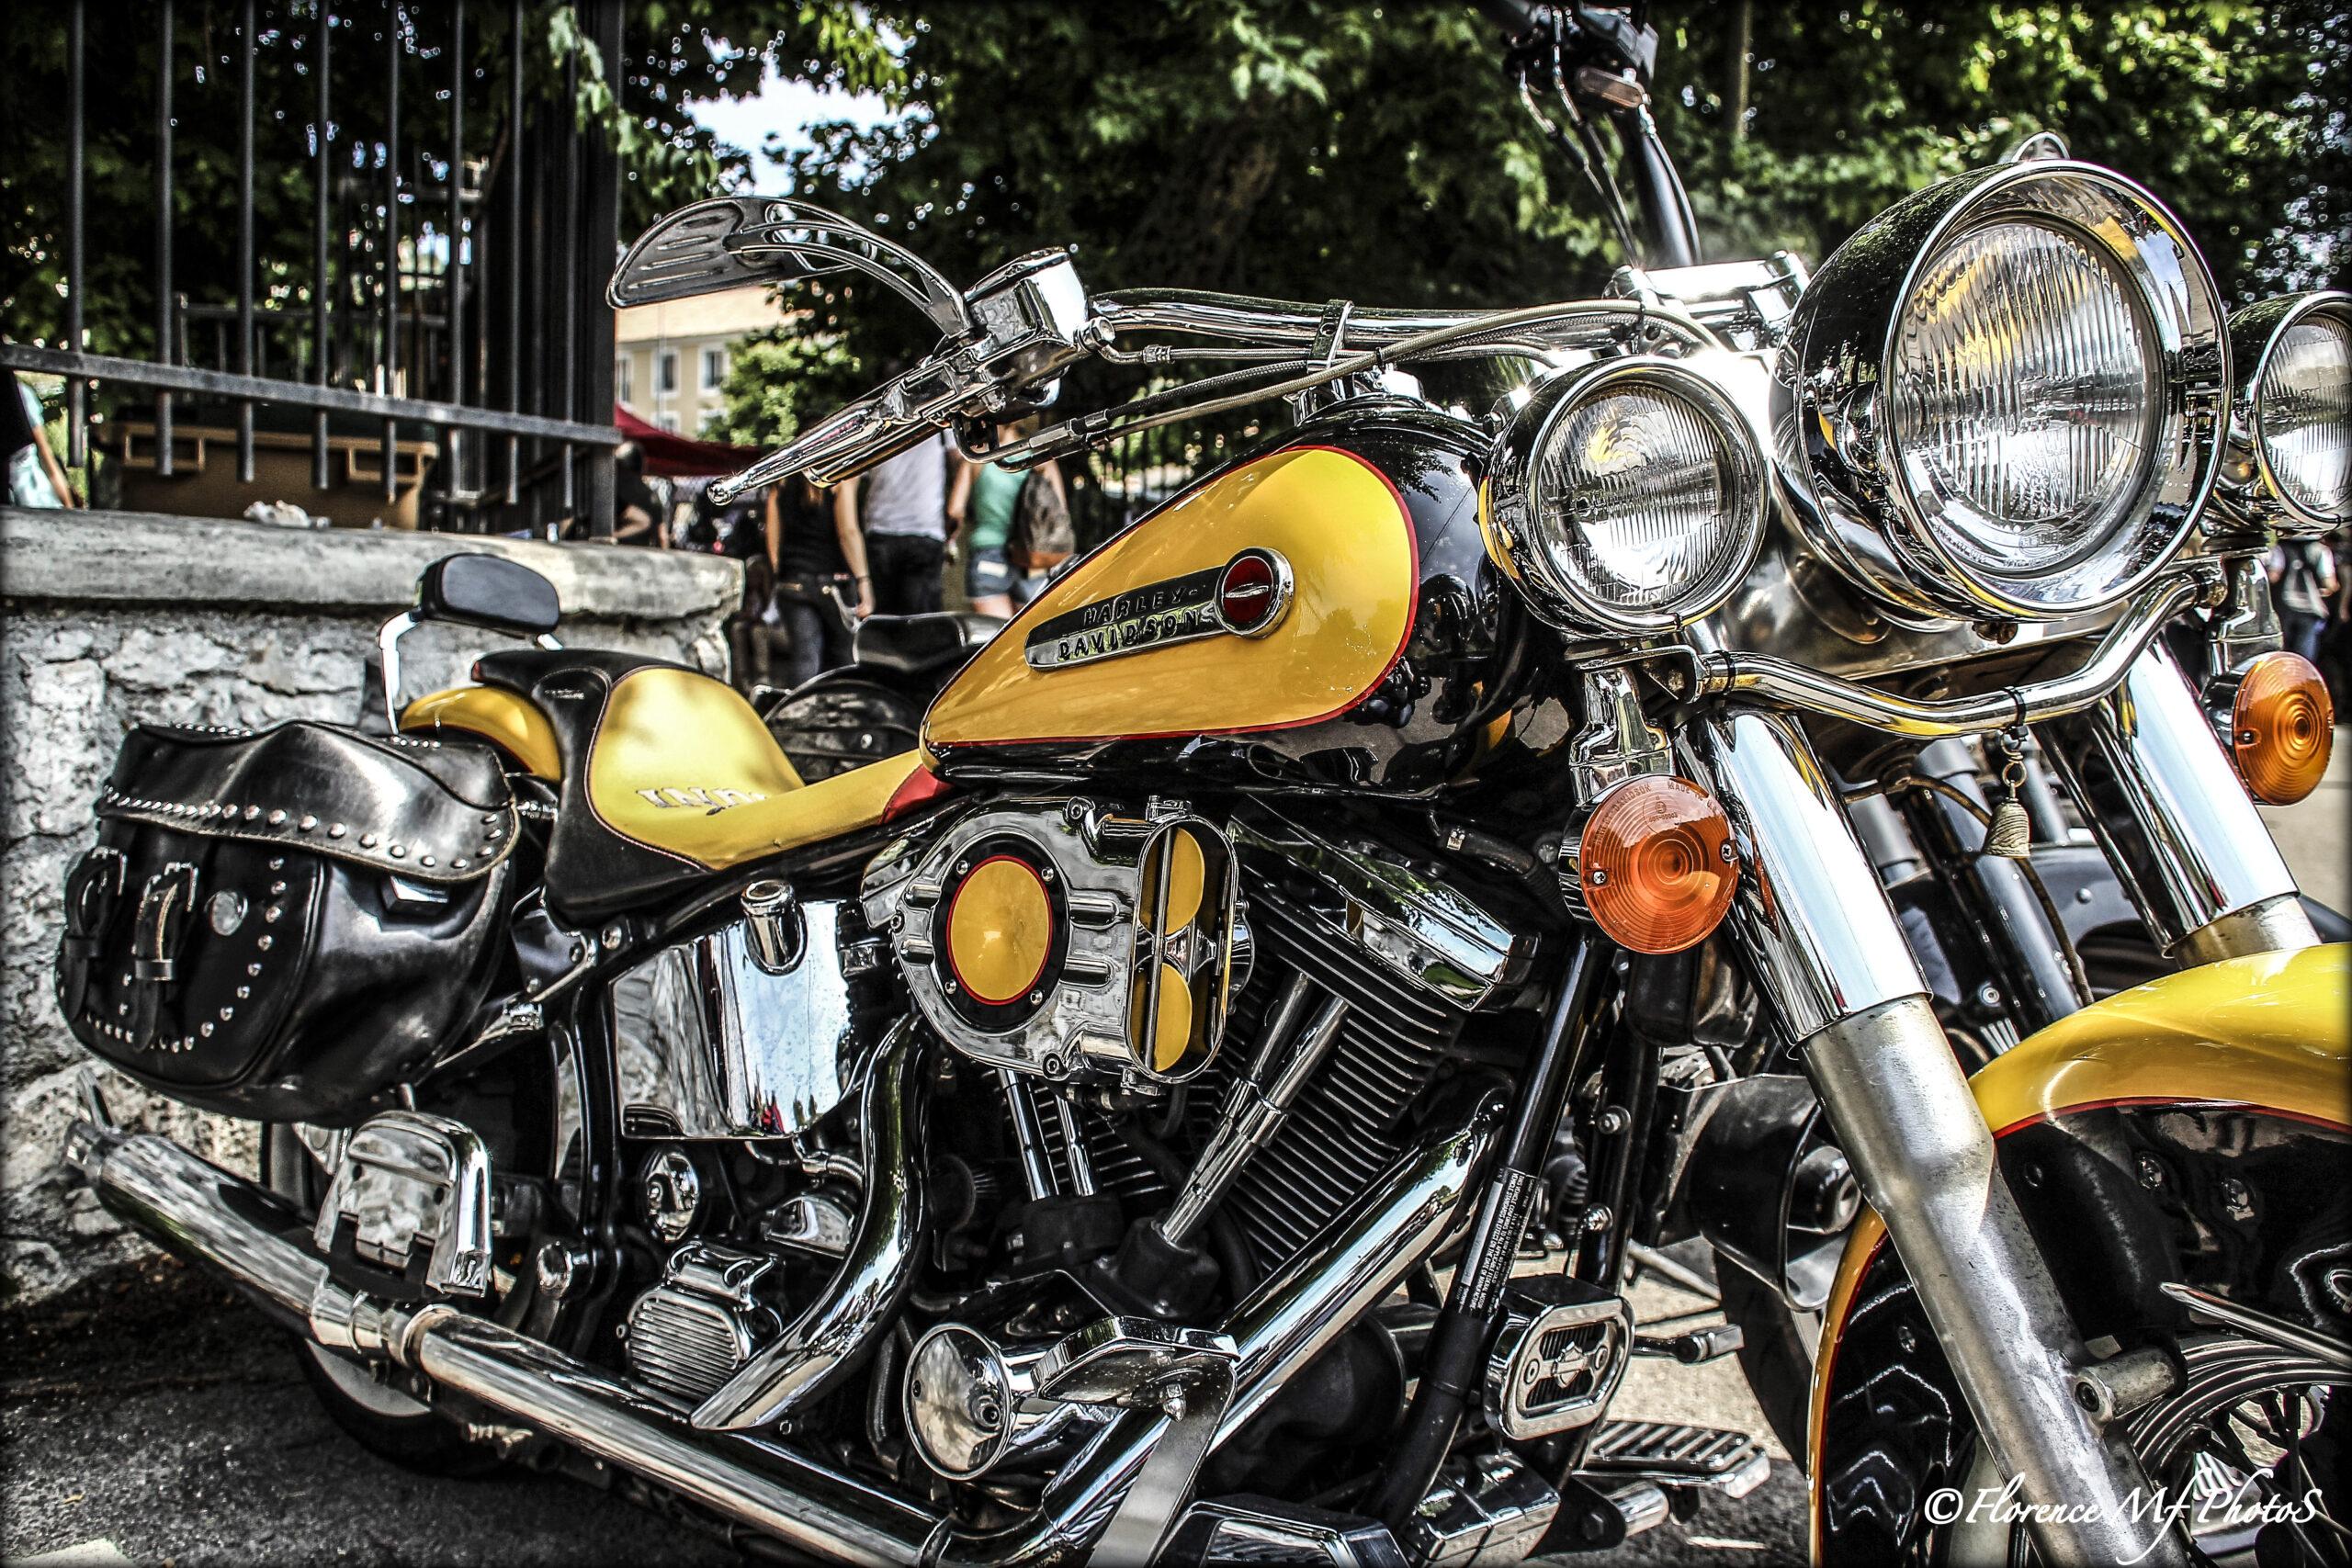 MOTO_Cars & Bikes style